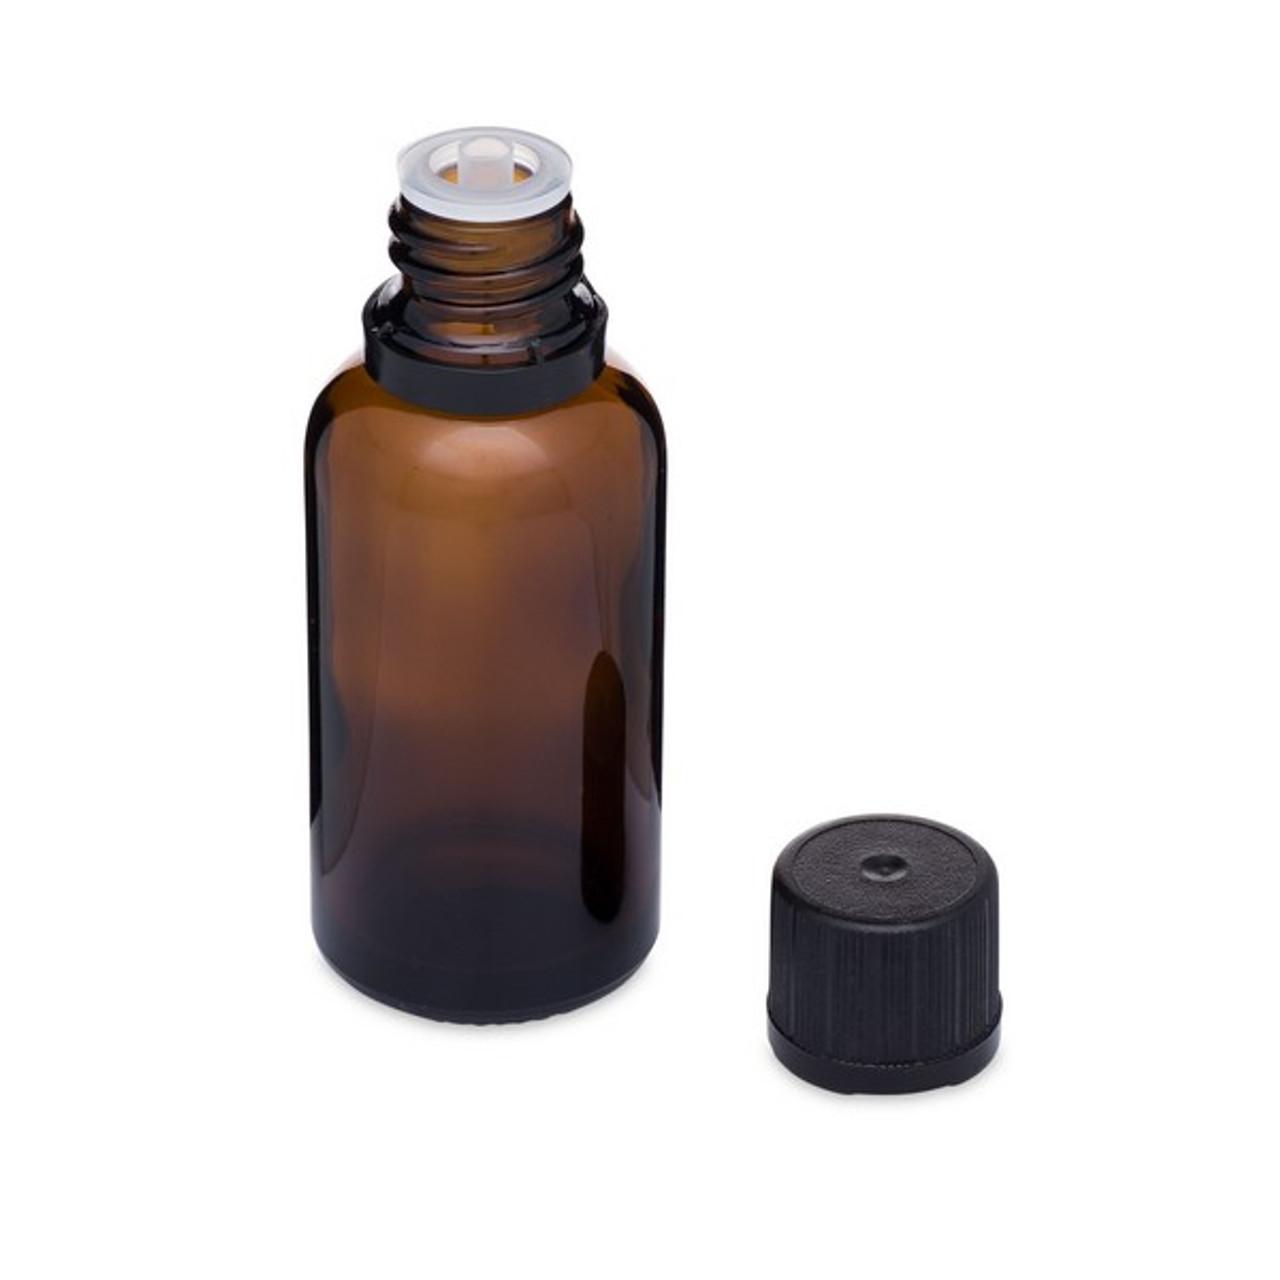 99c11ede708d 1 oz Amber Glass Euro Dropper Bottles (Tamper-Evident Cap) - 8624B07ABR